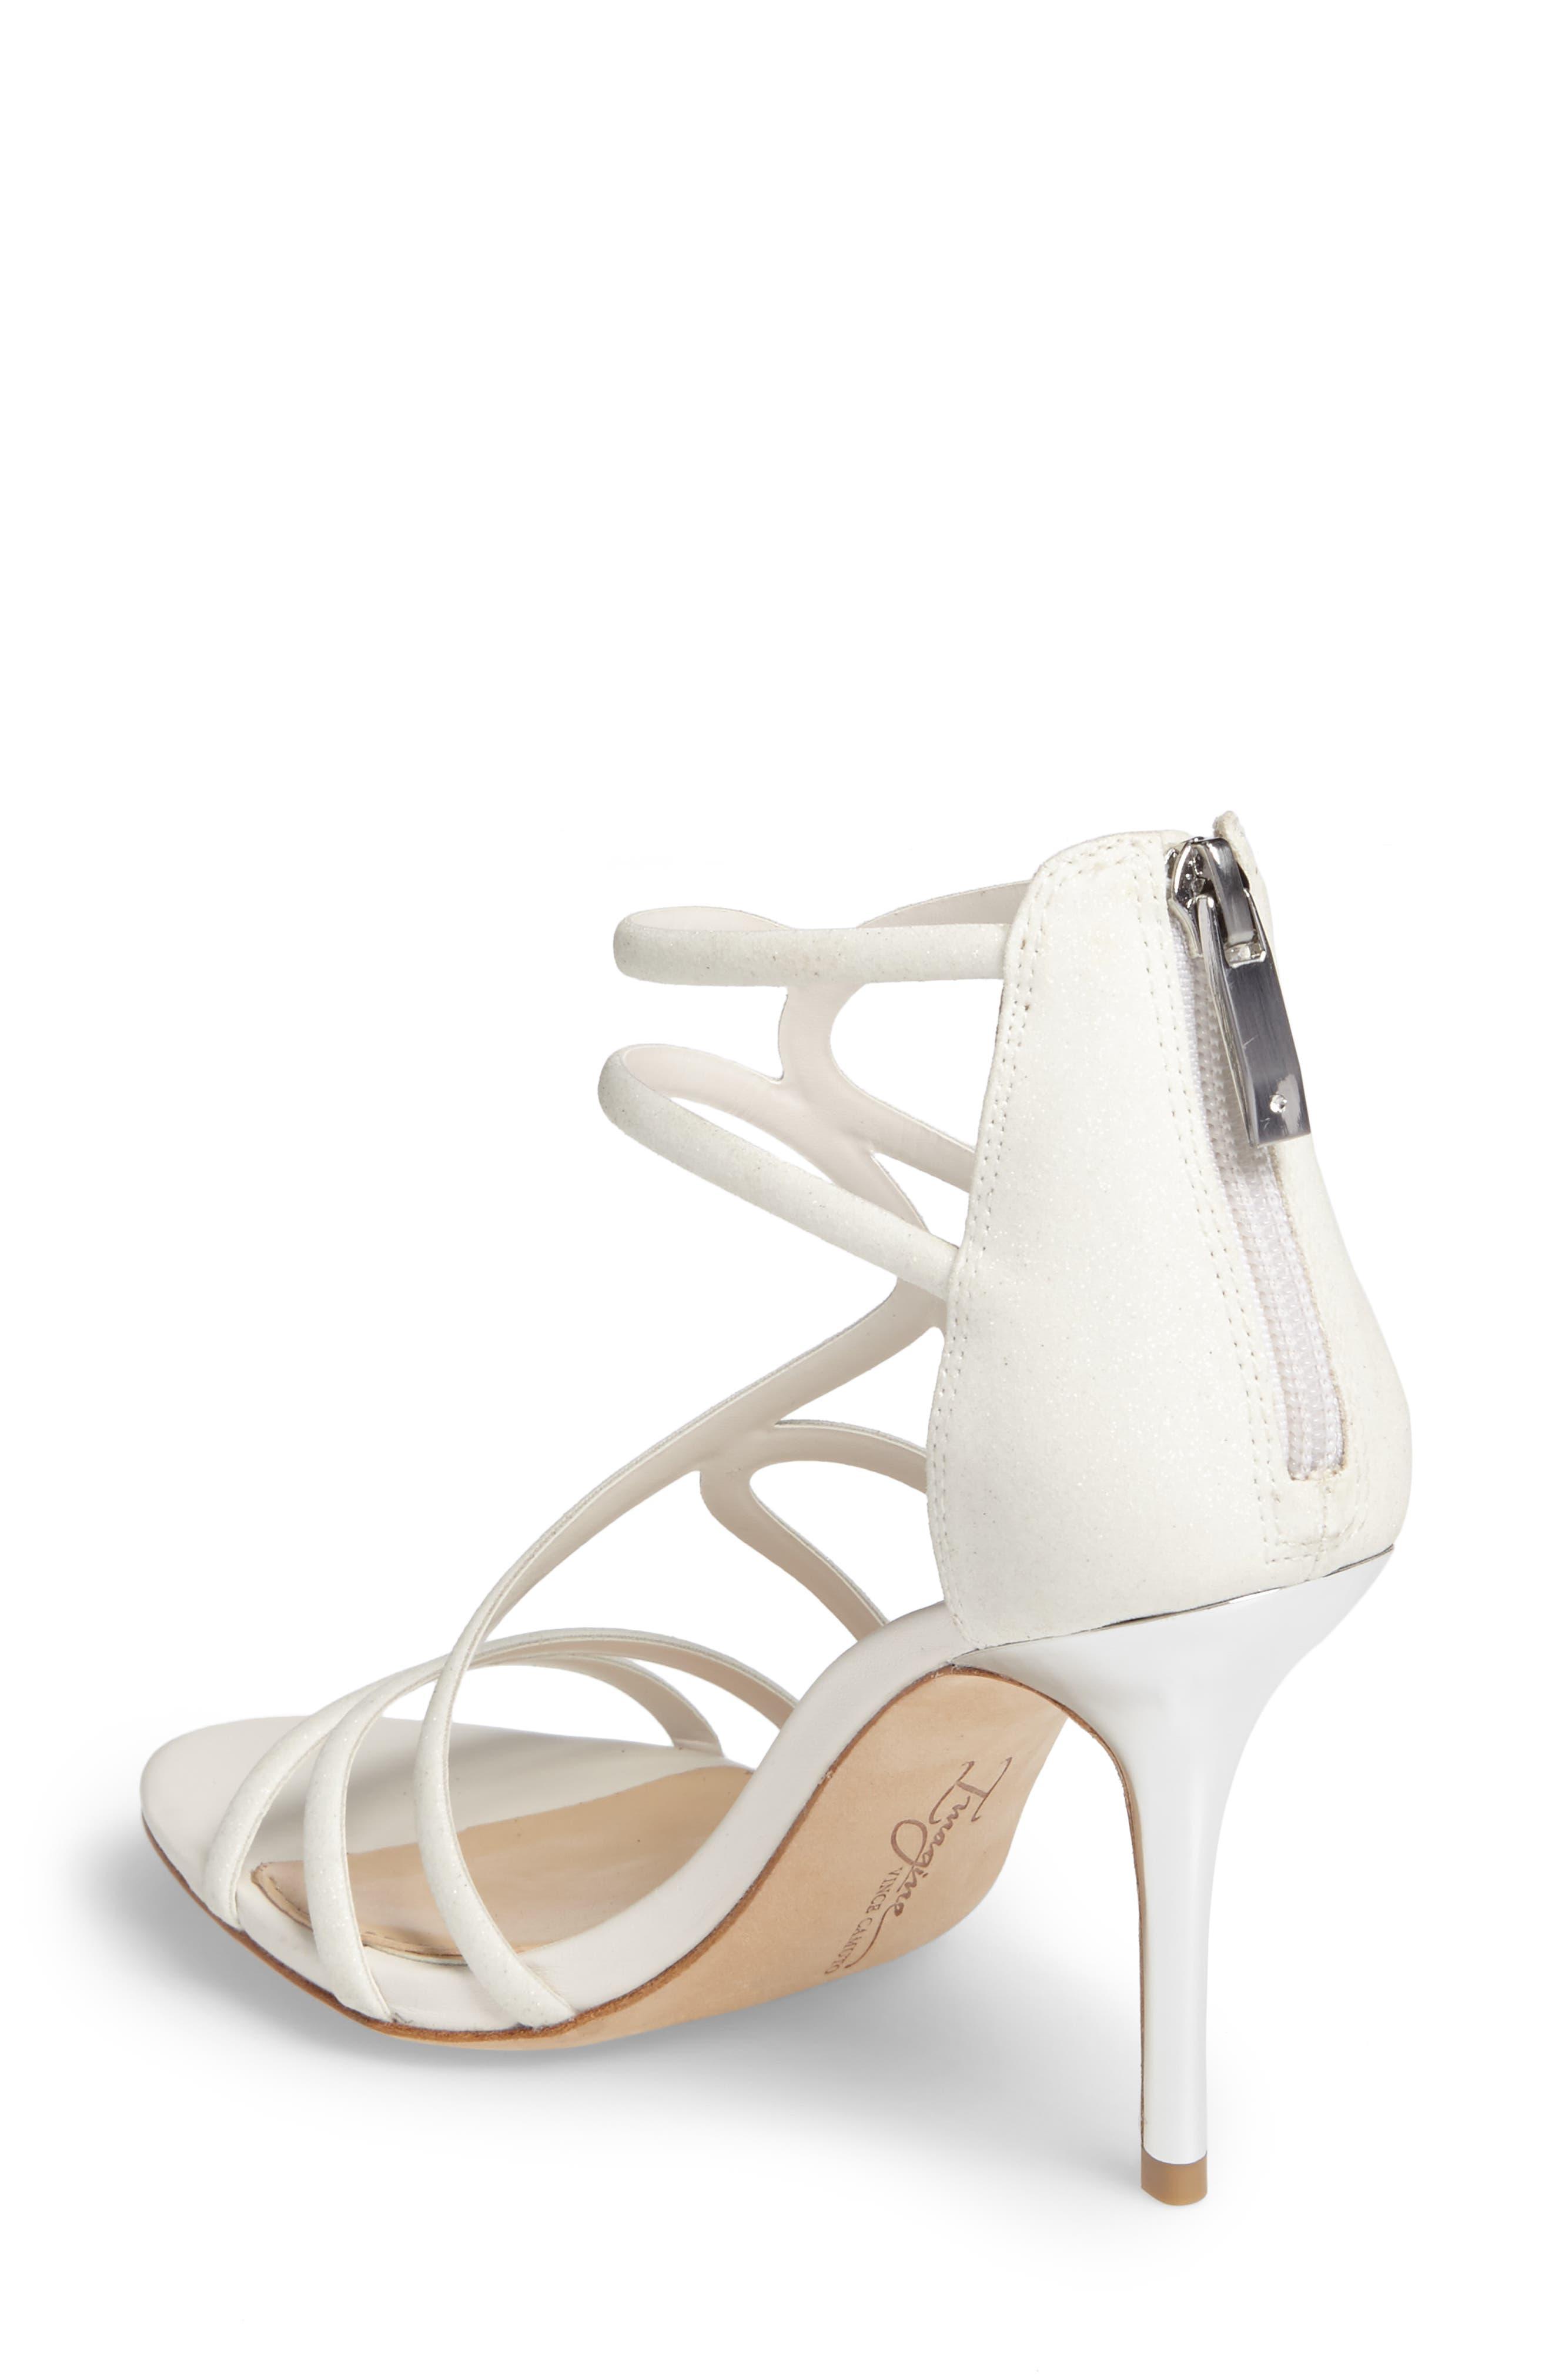 'Ranee' Dress Sandal,                             Alternate thumbnail 9, color,